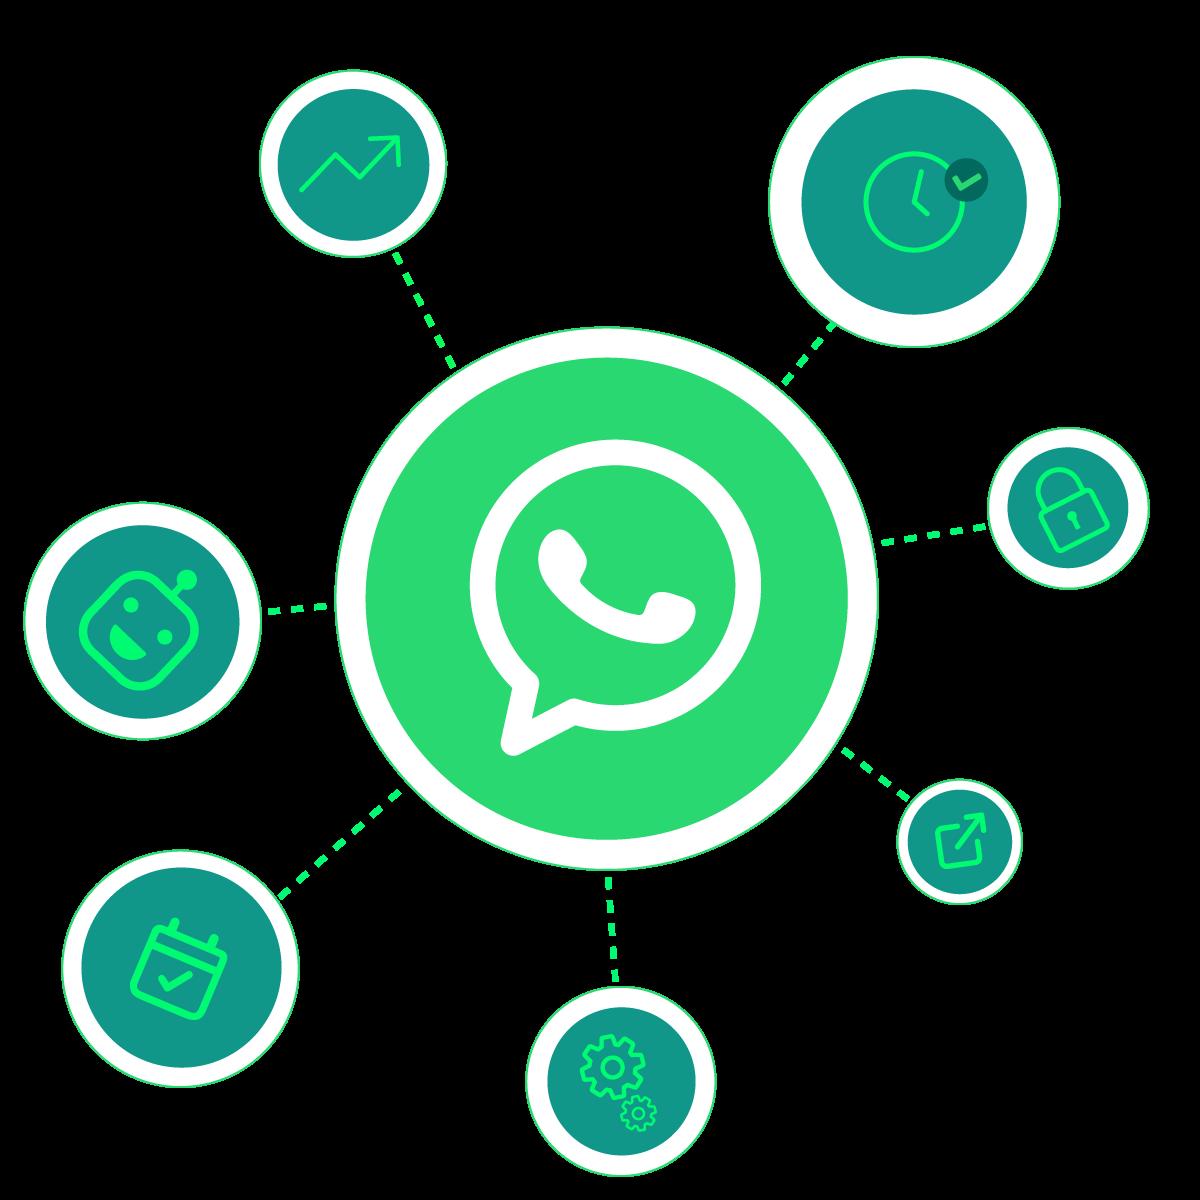 whatsapp_business_api_costos1